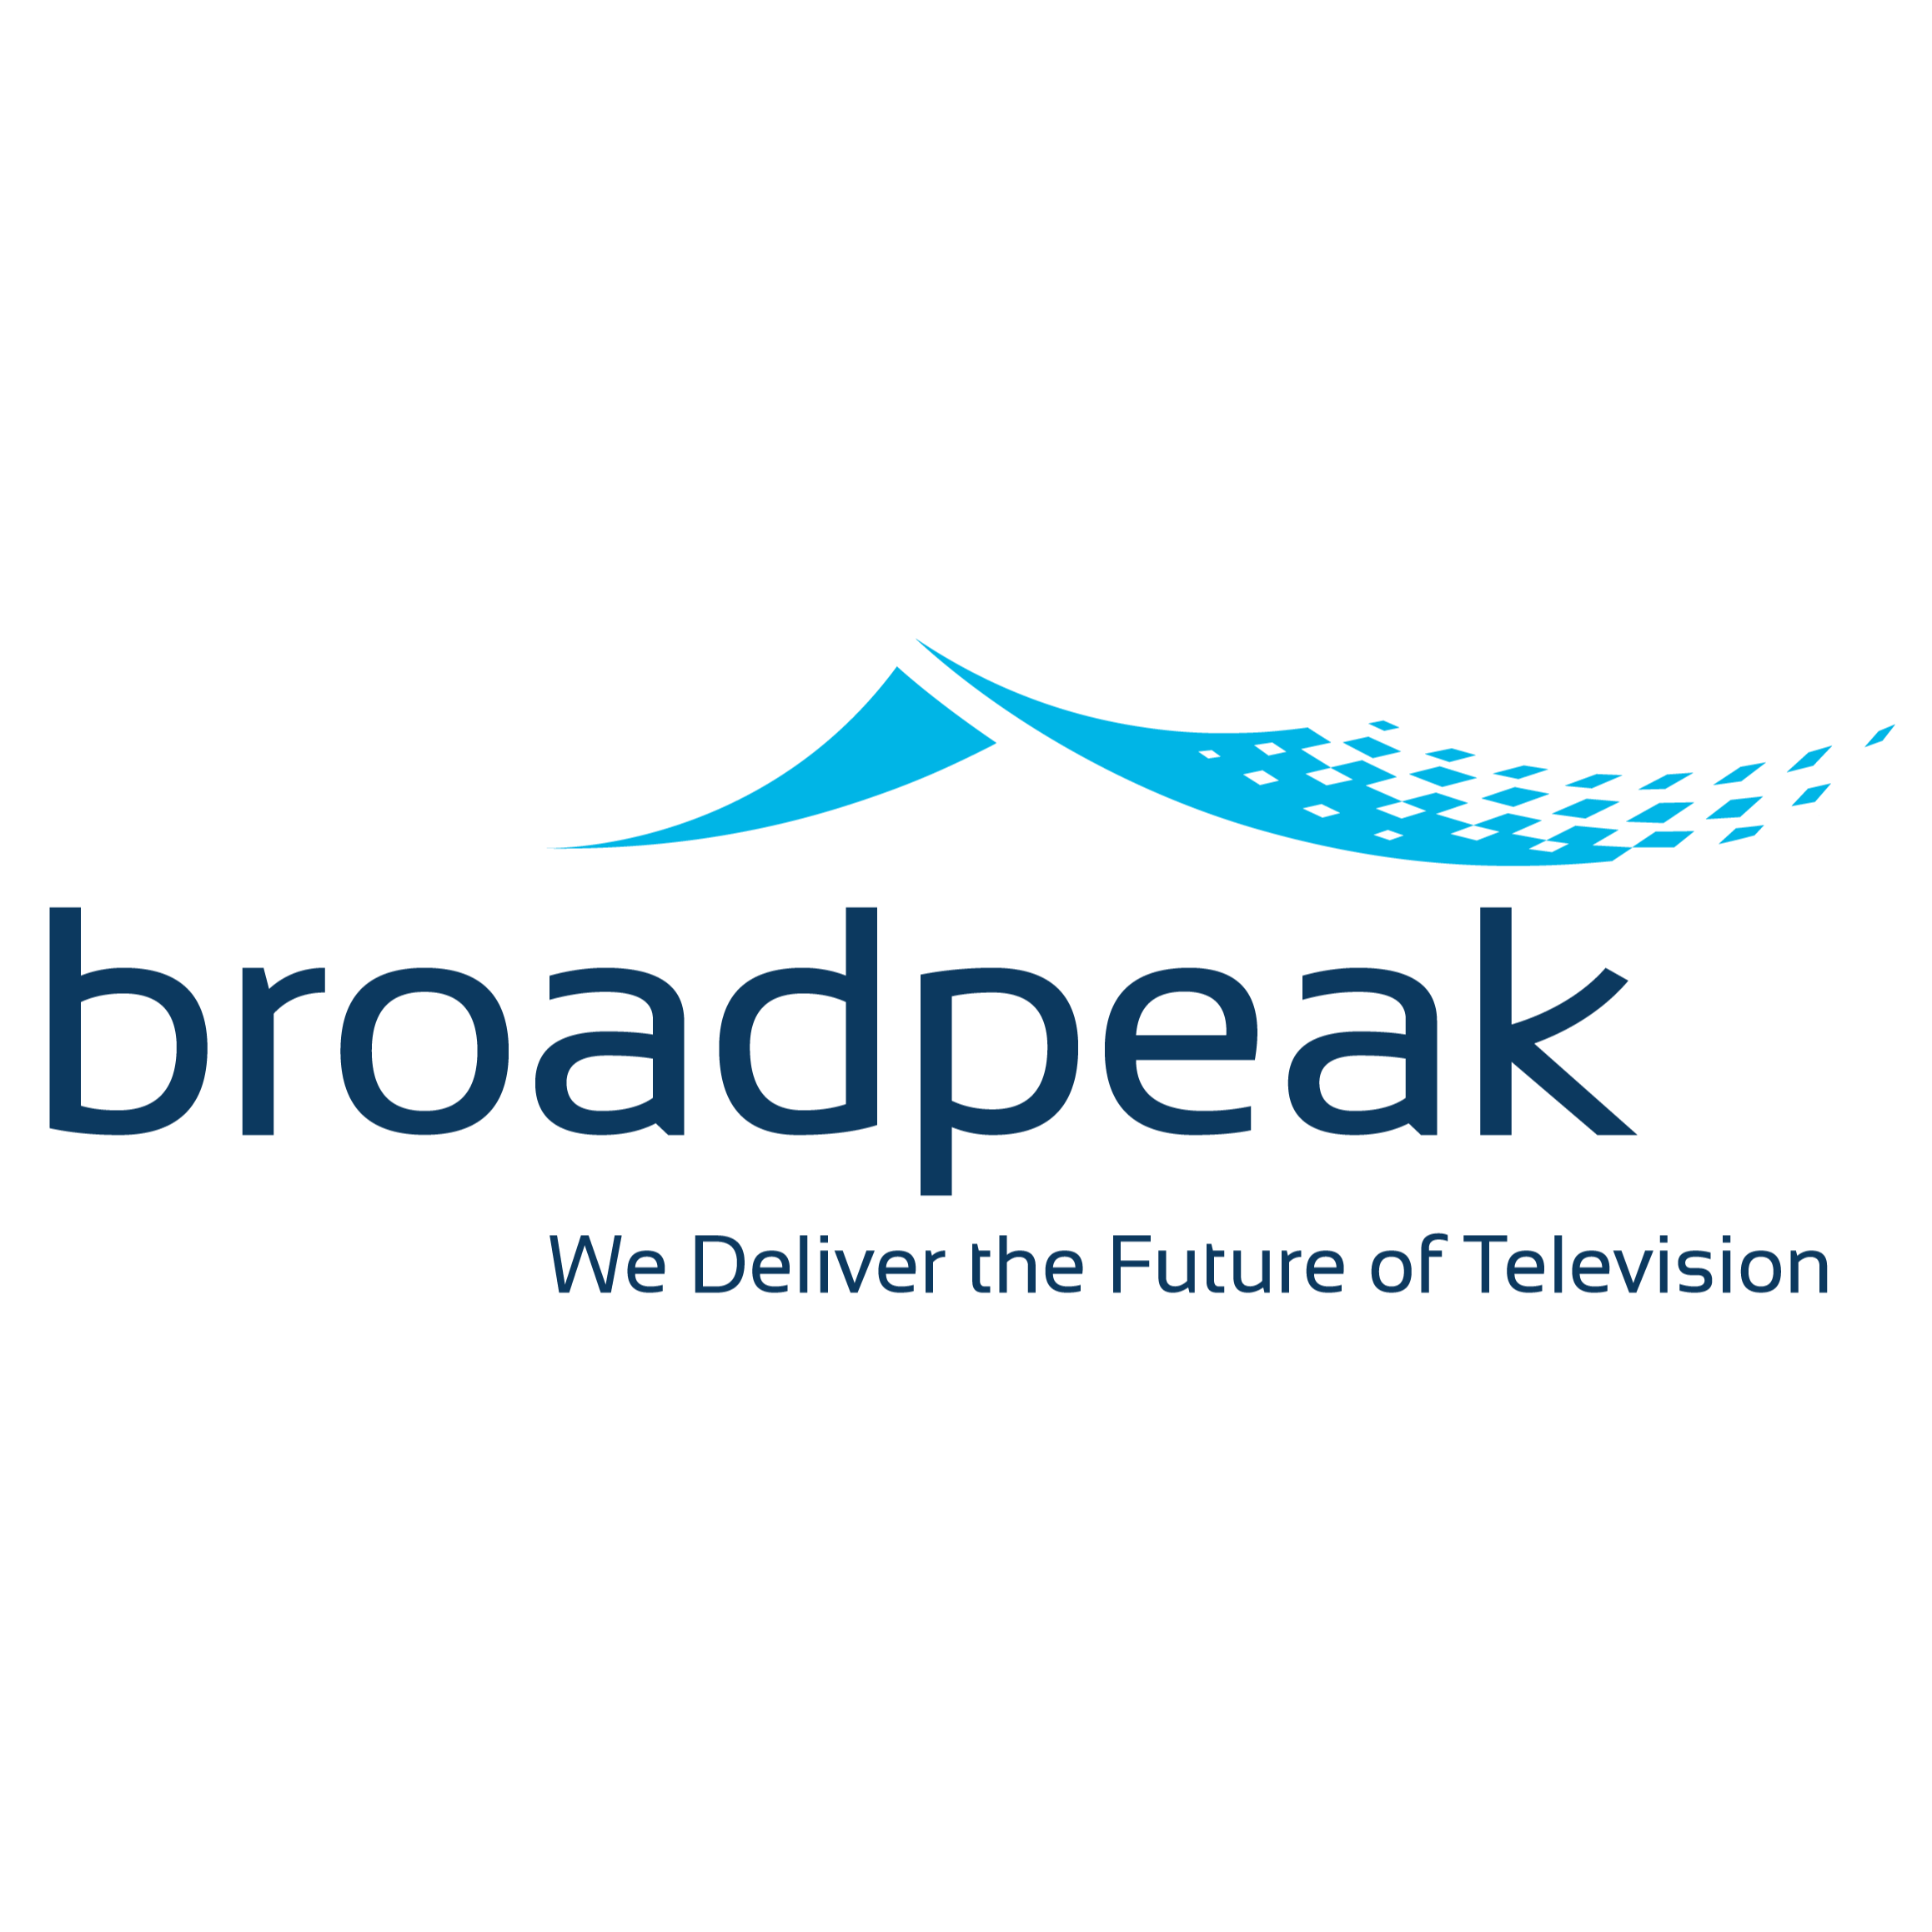 Broadpeak Profile Picture